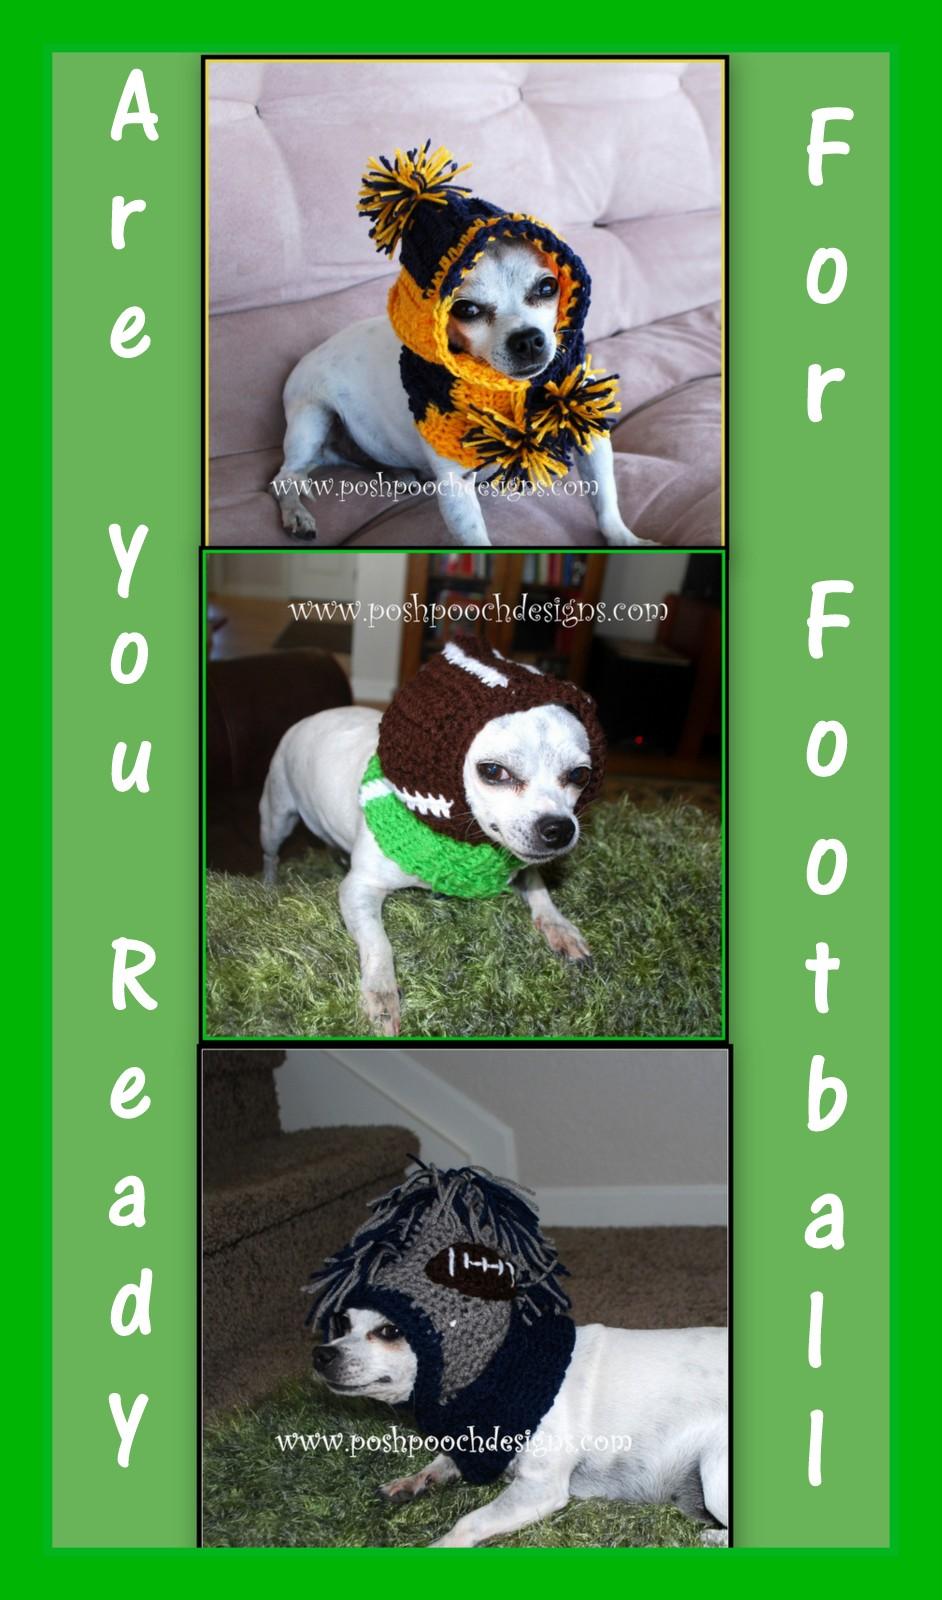 Posh Pooch Designs Dog Clothes: 3 Dog Snoods New Crochet Pattern ...